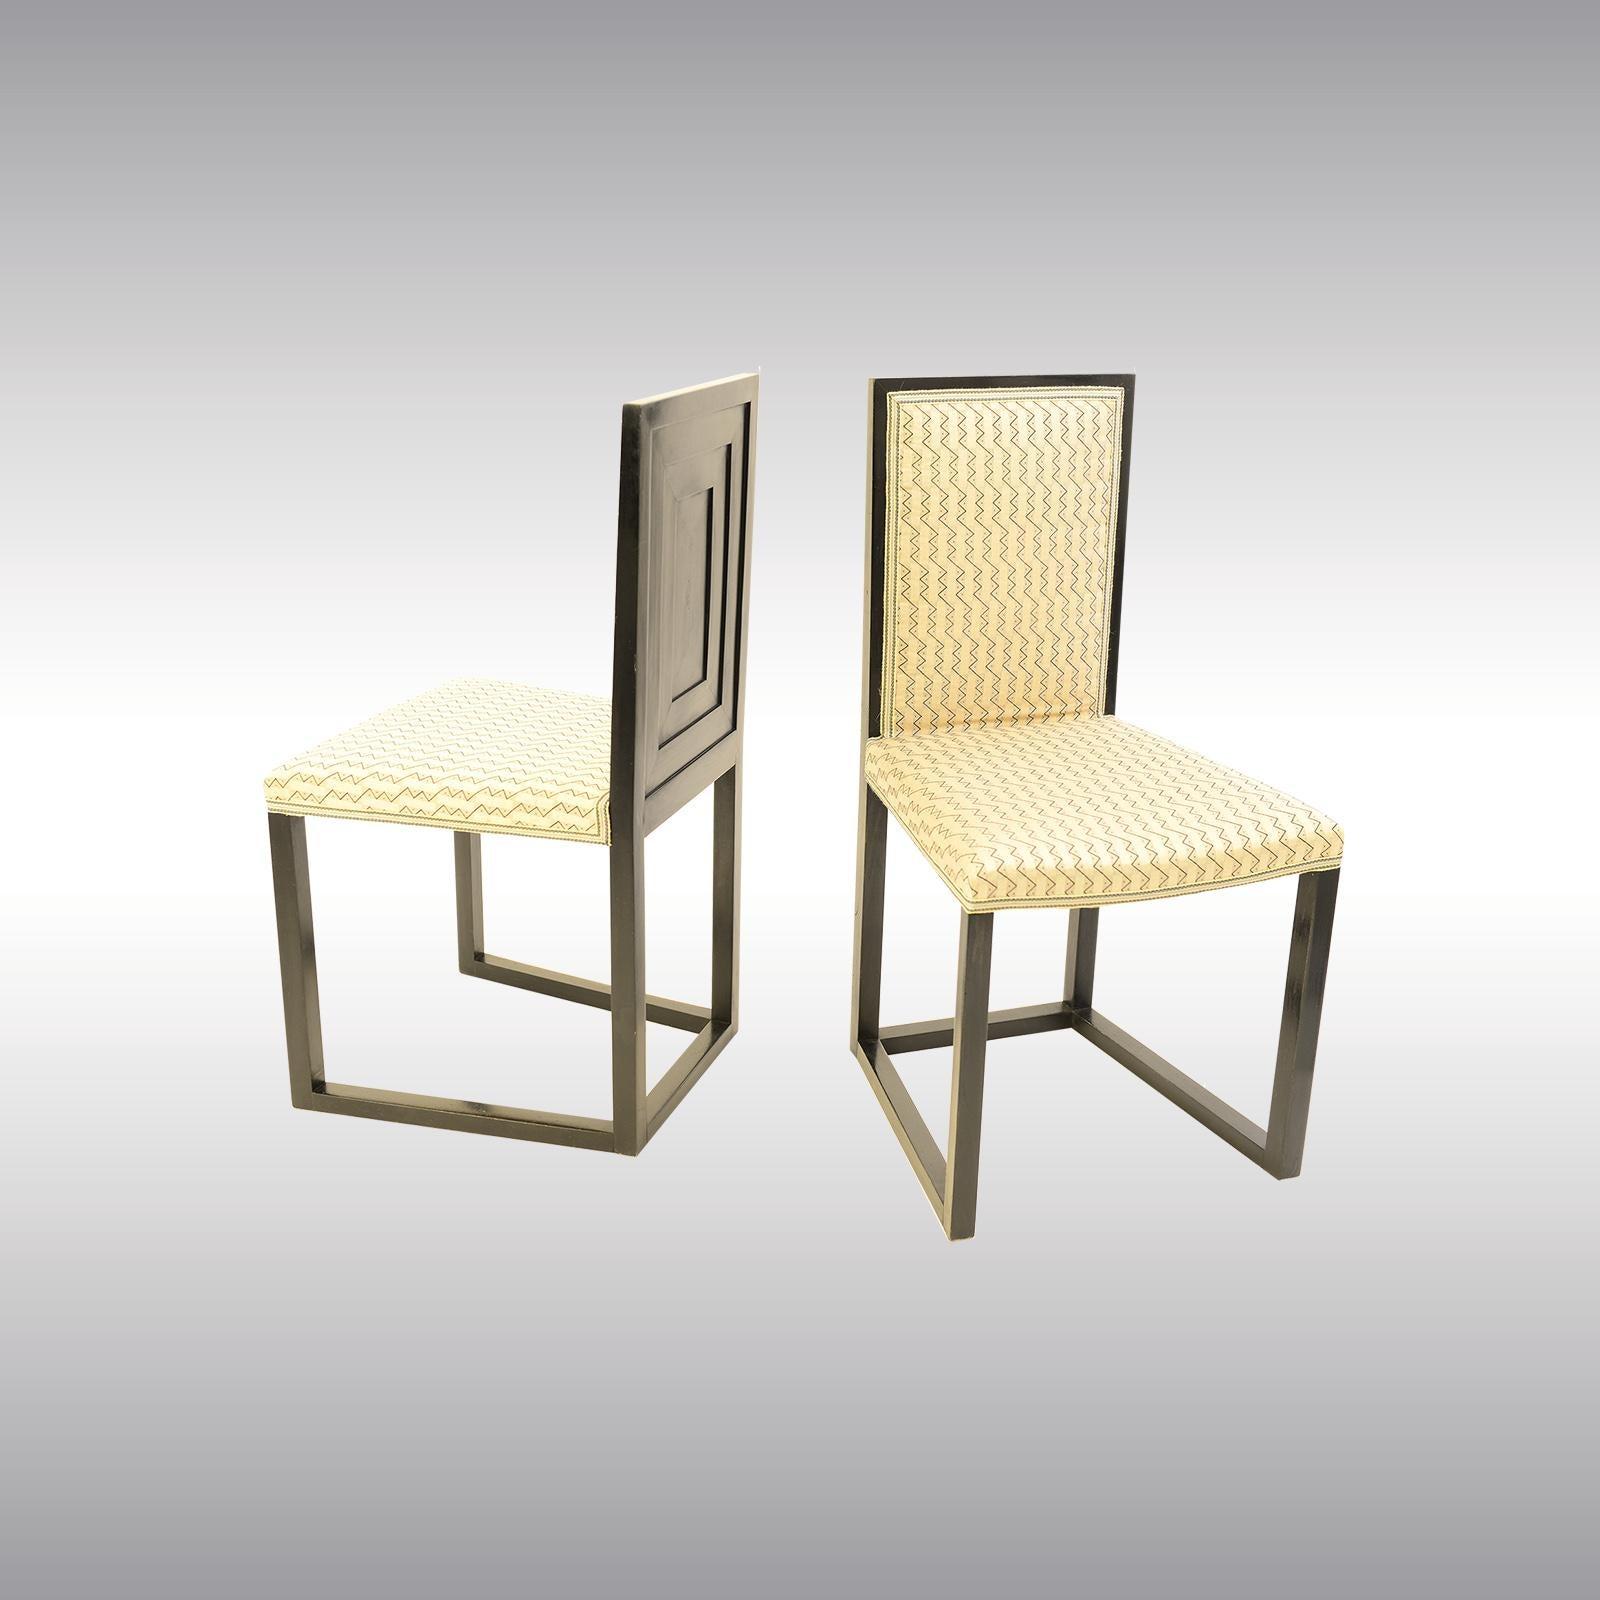 Pair Of Original Josef Hoffmann Wiener Werkstätte Chairs 1904 Jugendstil